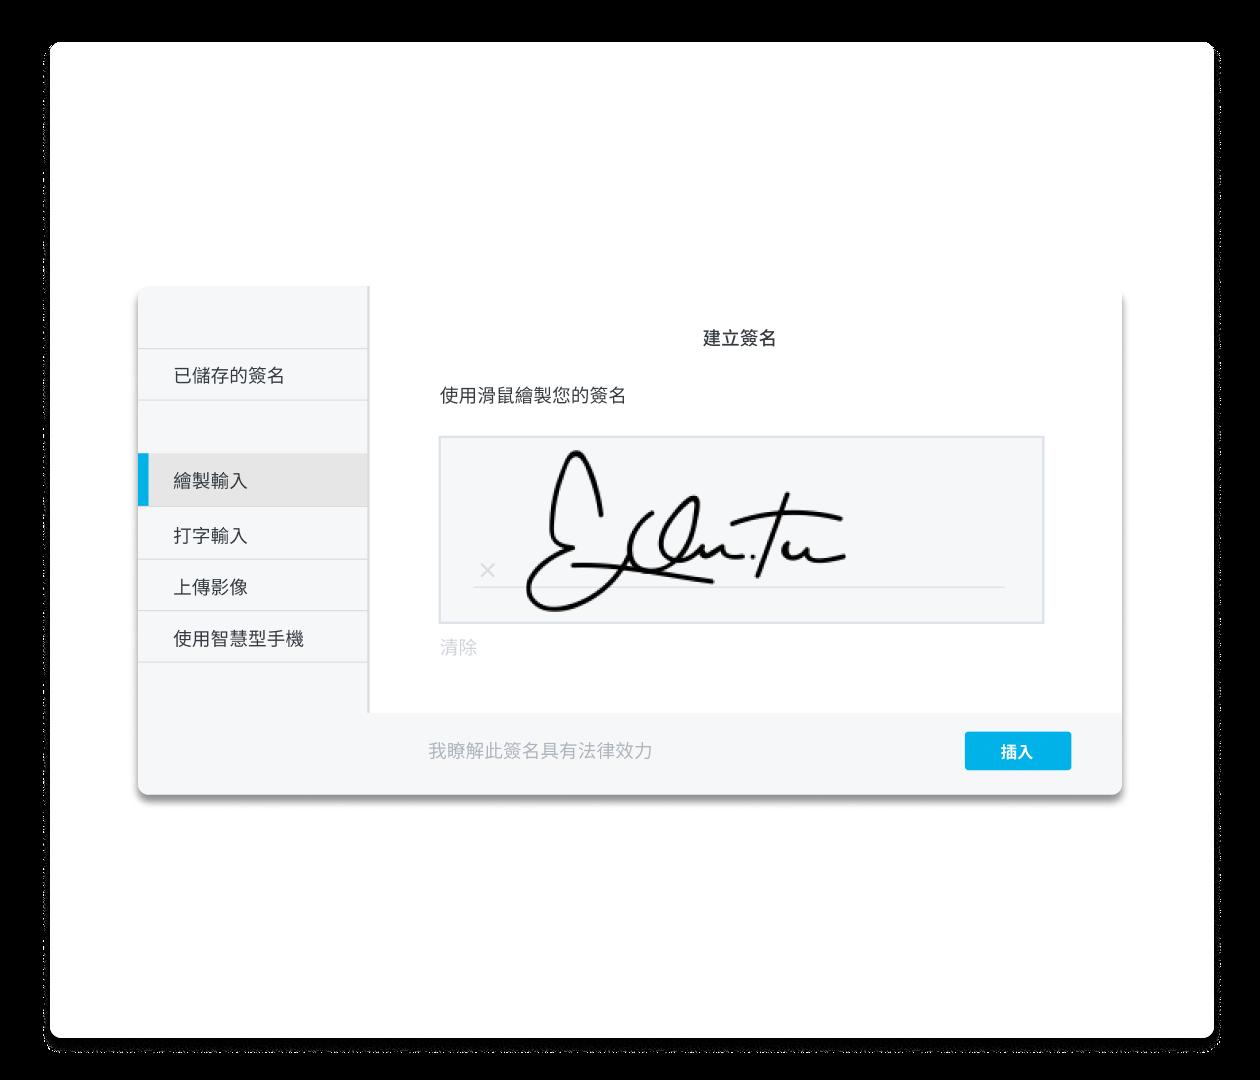 HelloSign 建立簽名體驗的螢幕截圖